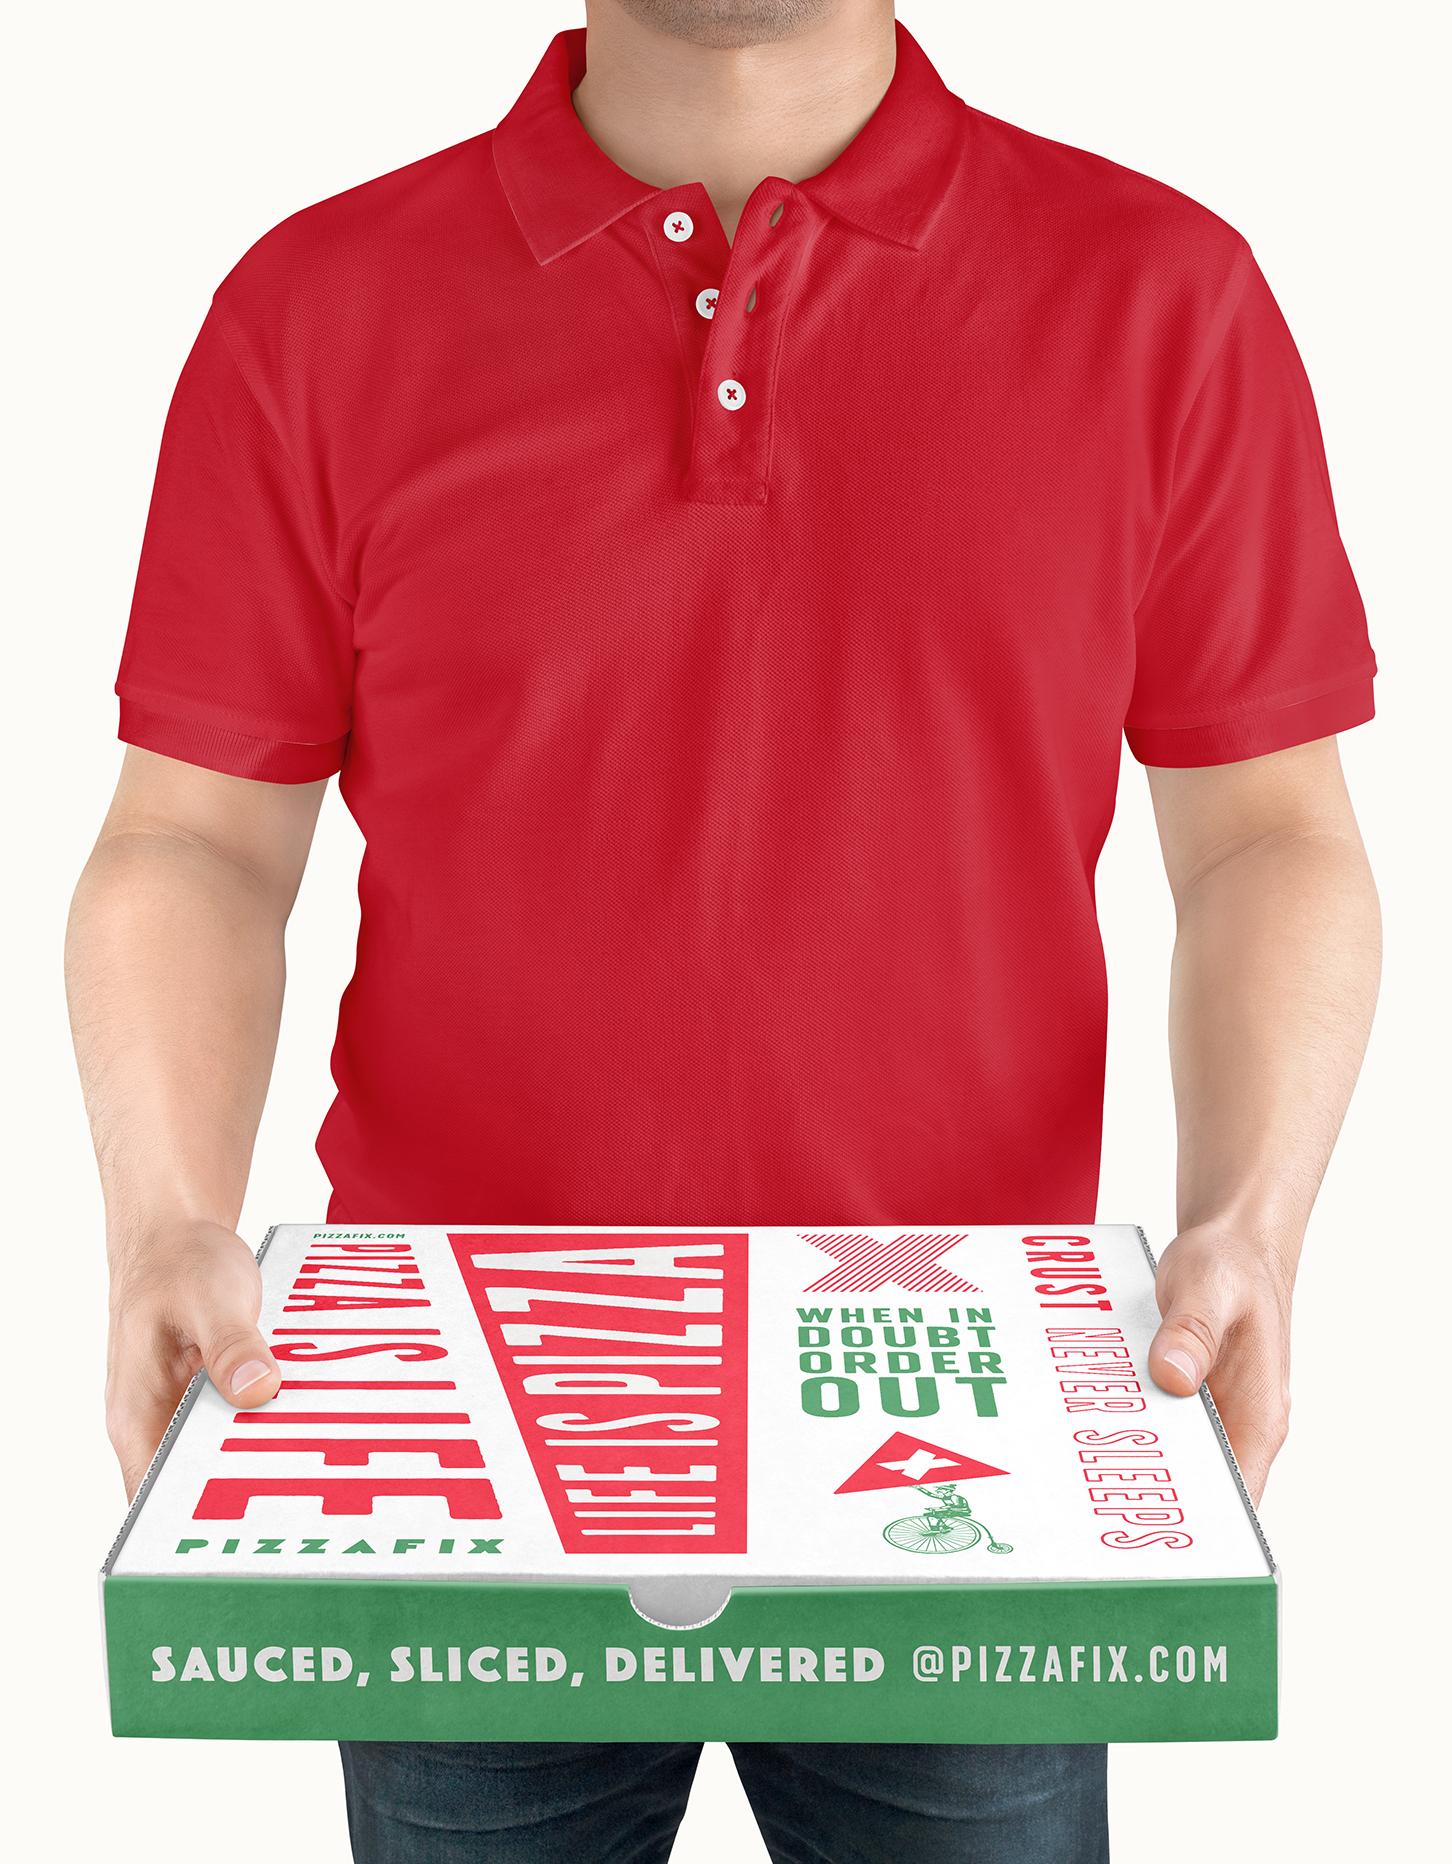 Chad Roberts Design Ltd. Pizzafix Pizza Delivery Box Package Design